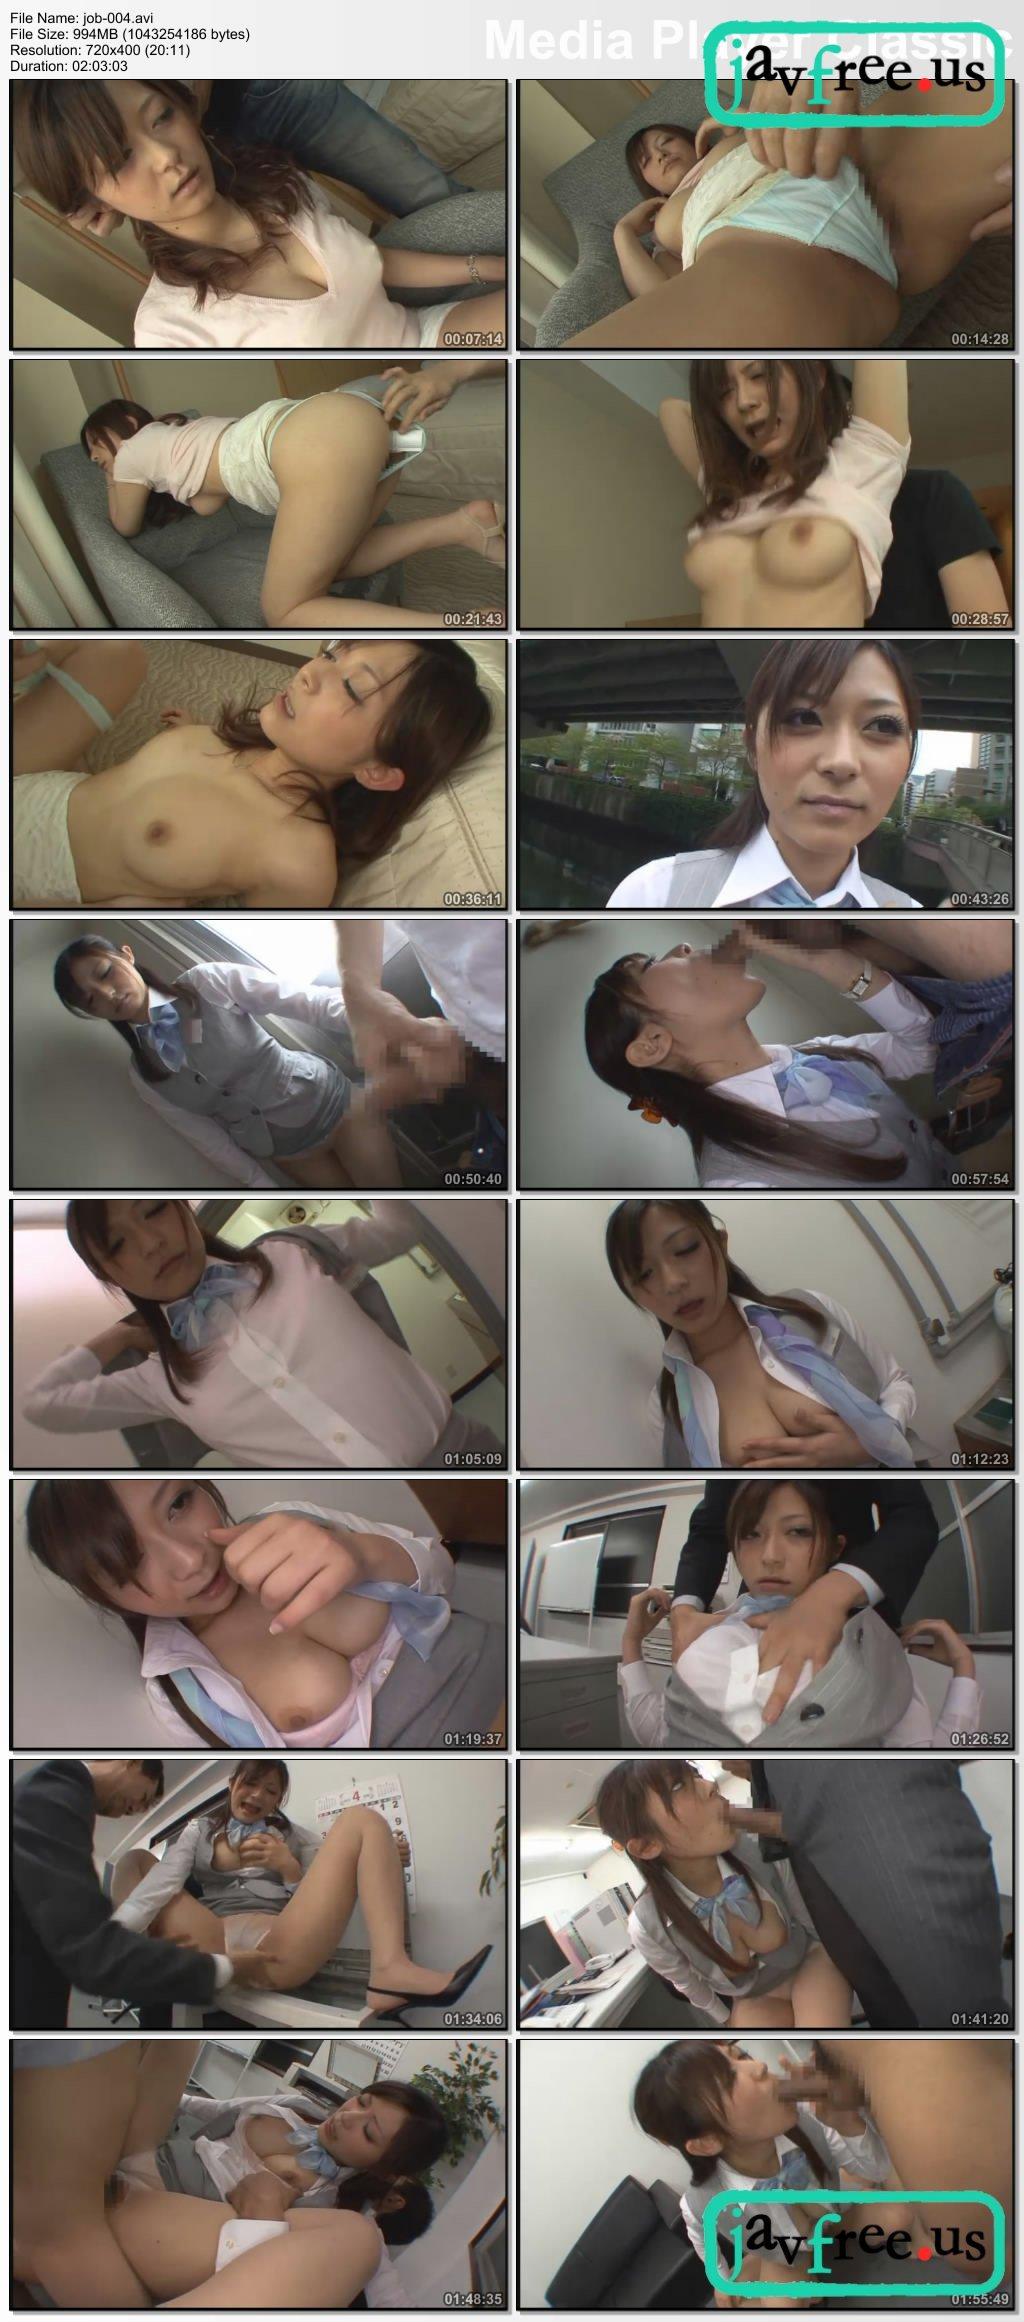 [HD][JOB 004] 働くオンナ2 VOL.04 さとう遥希 job